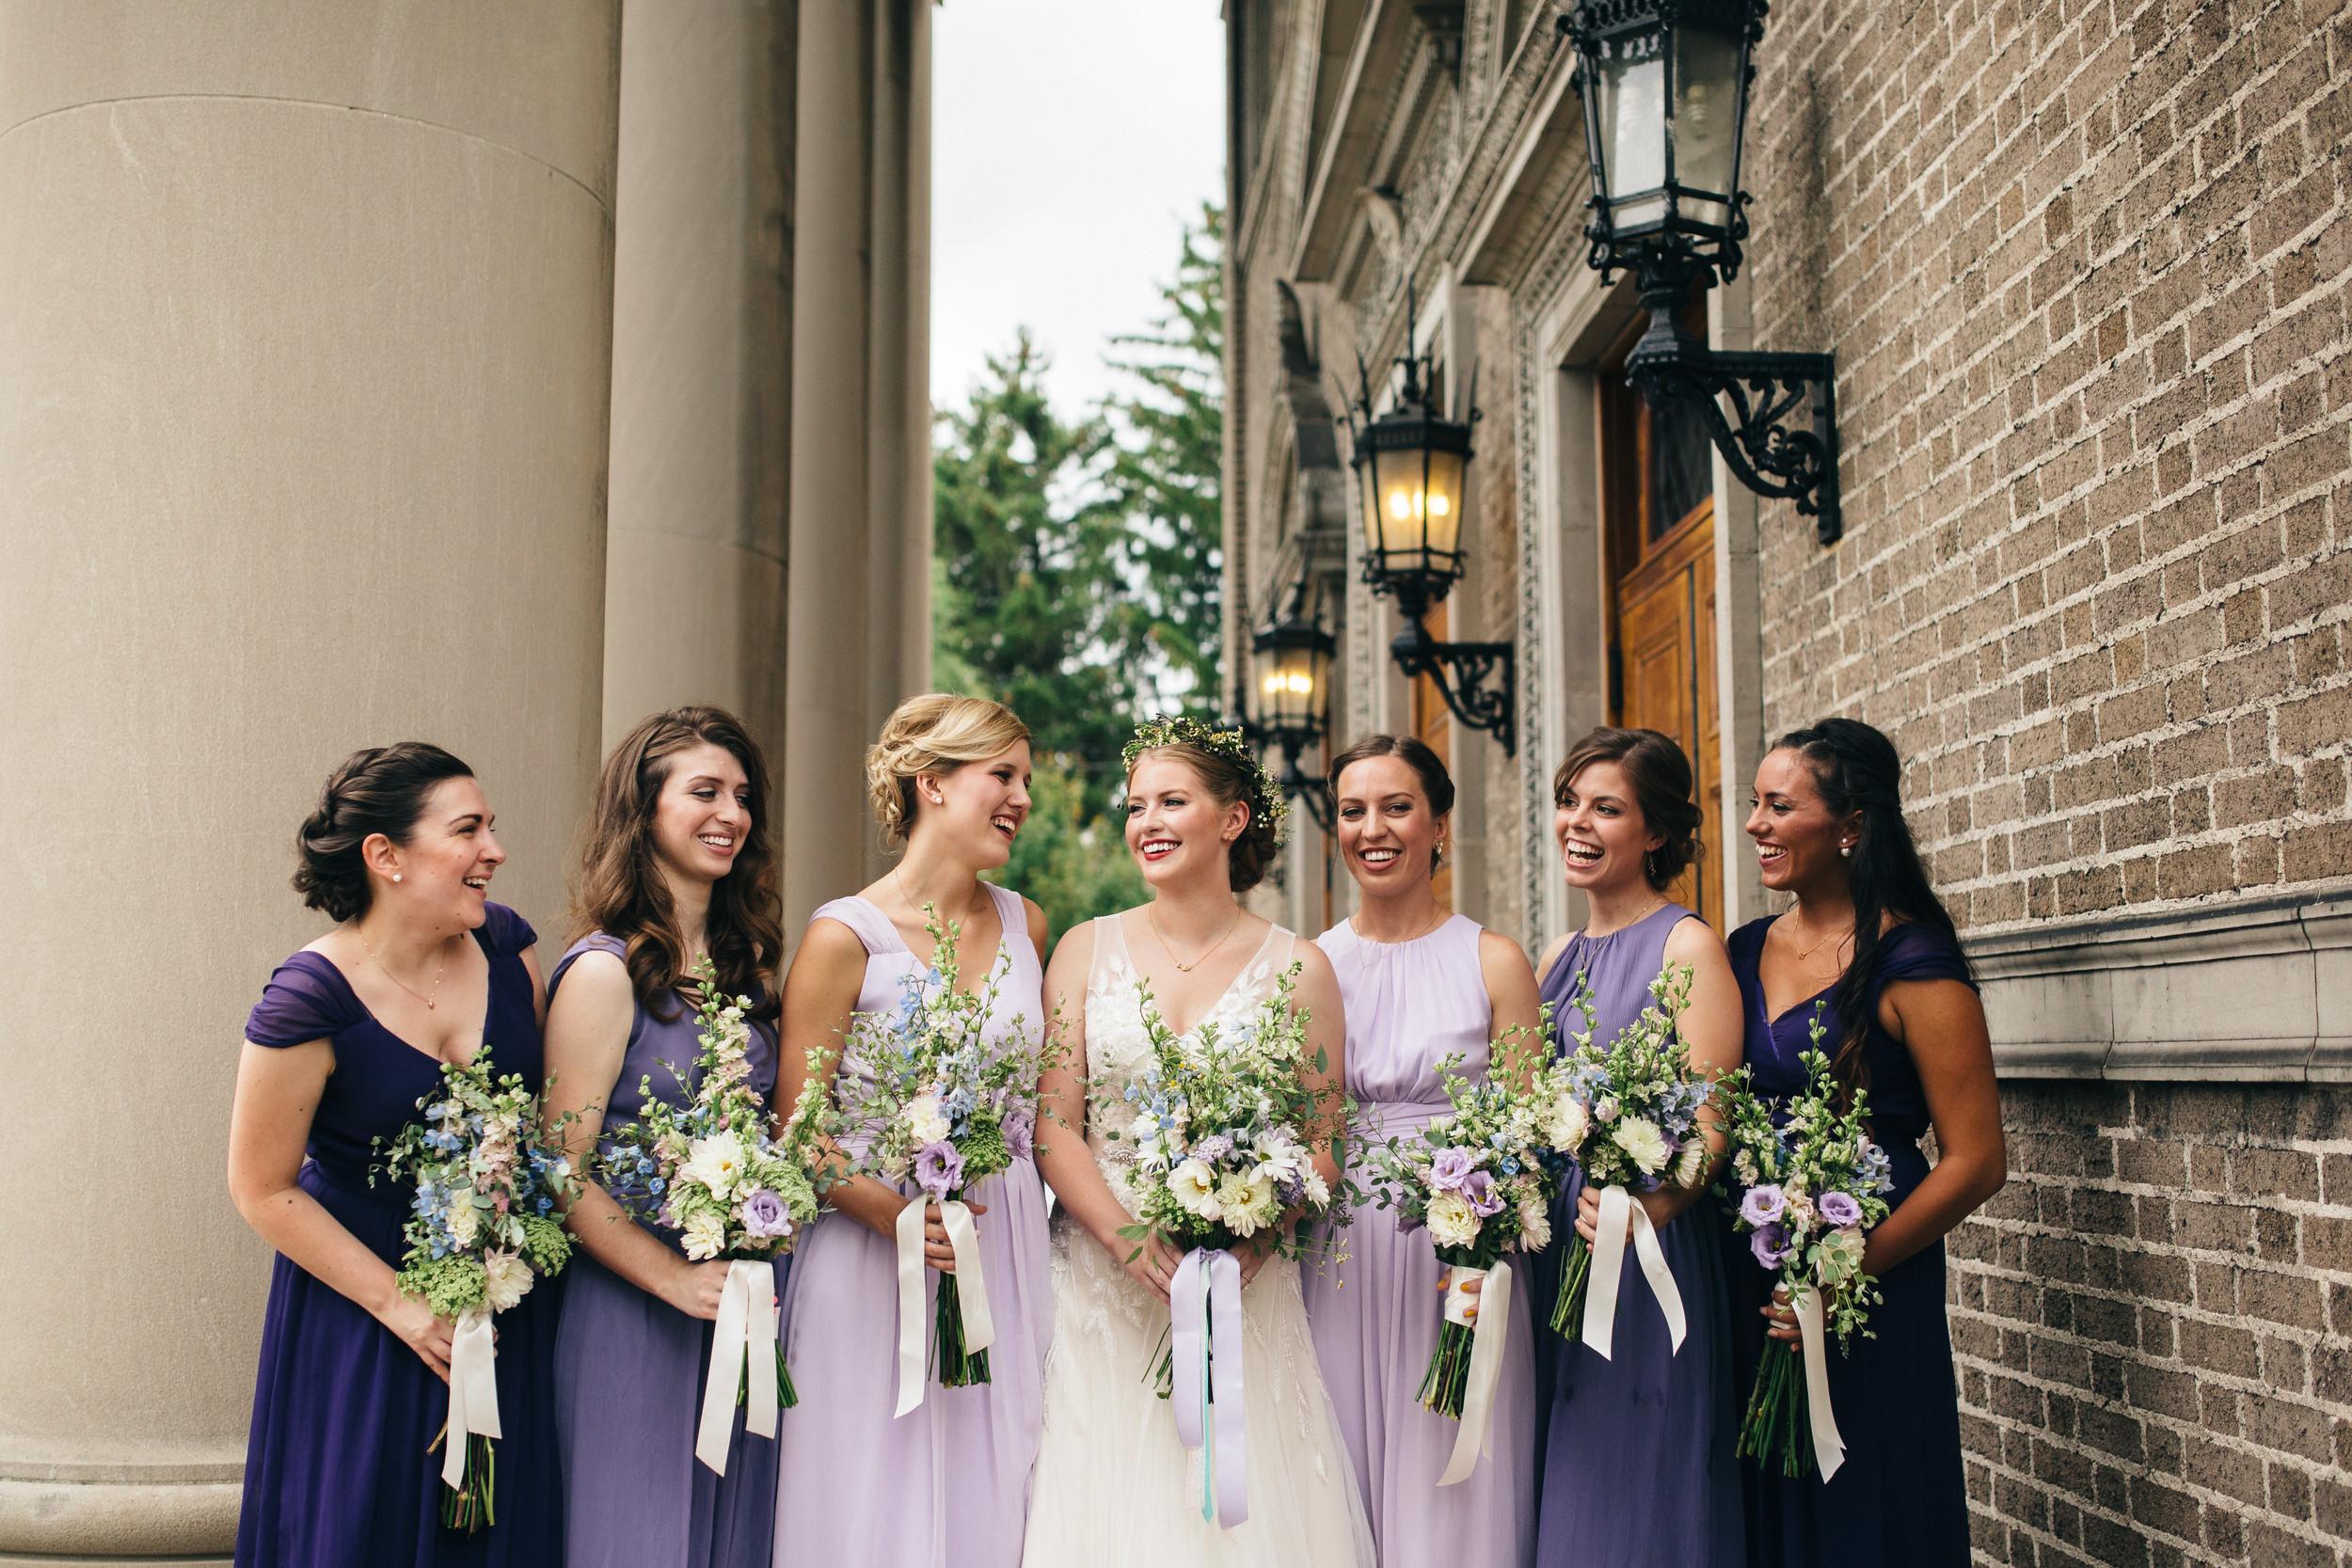 Bridesmaids in purple ombre dresses.